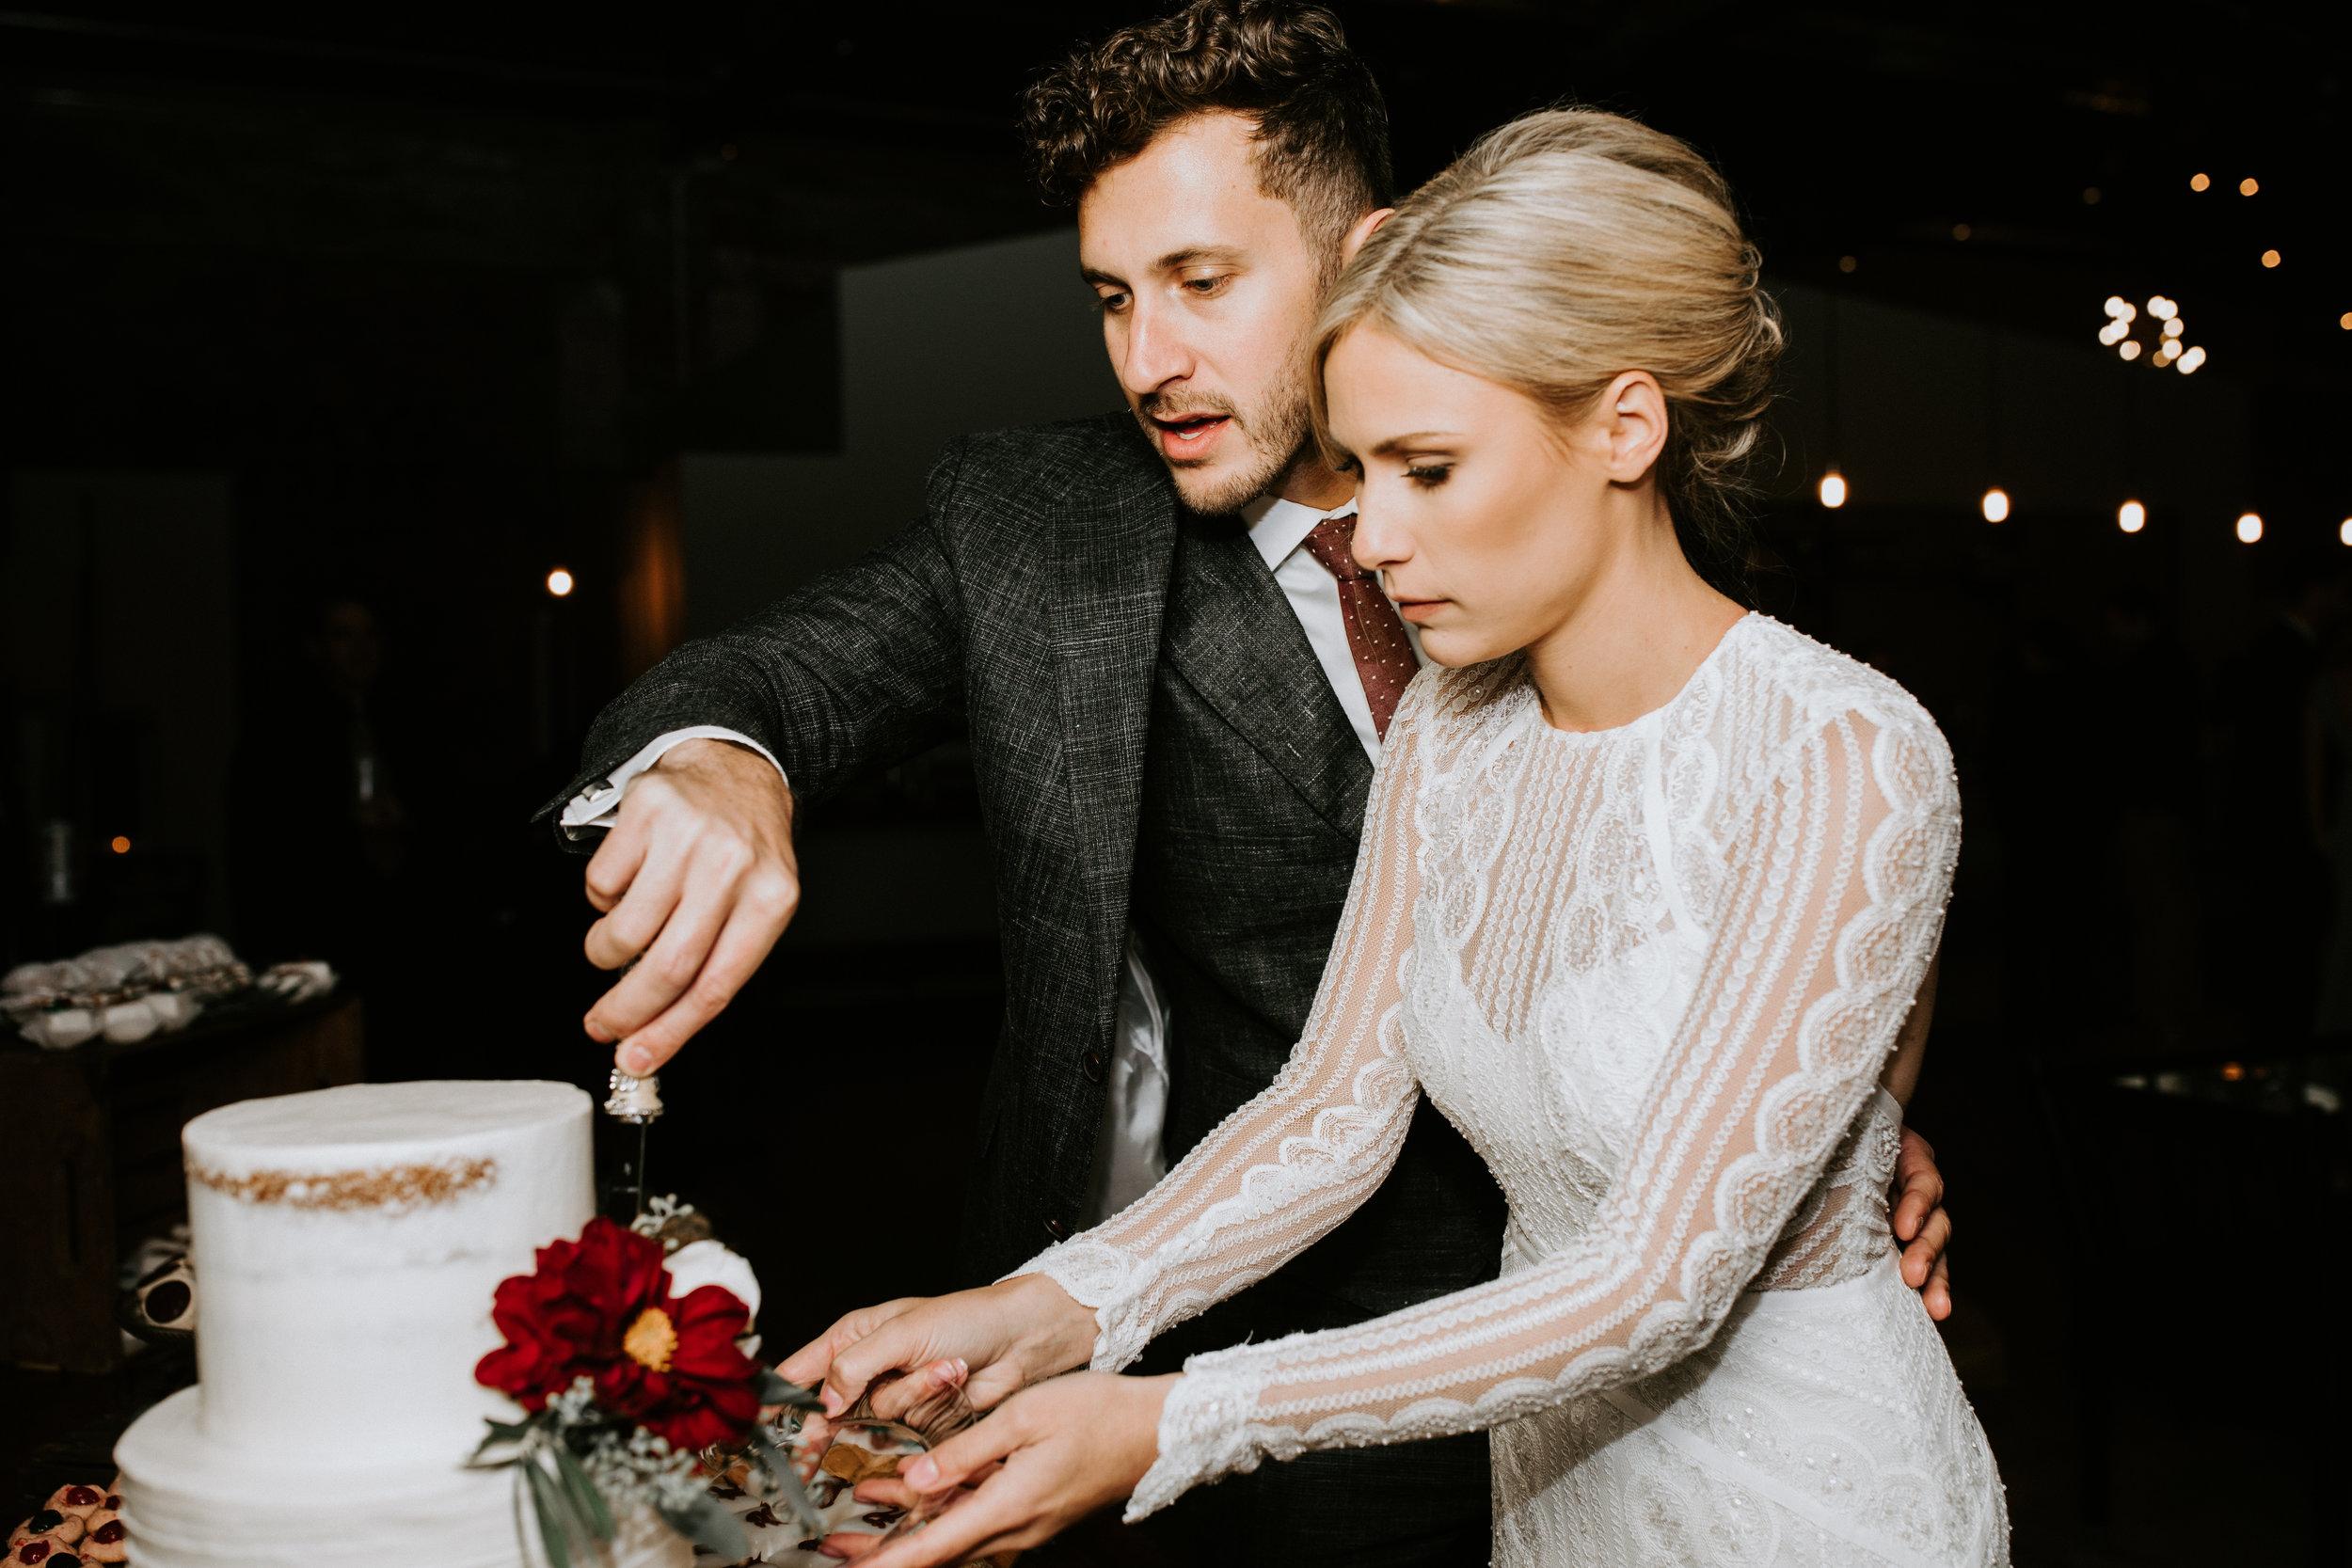 ST_LOUIS_WEDDING_PHOTOGRAPHER_WILD_CARROT_EMILY_AND_JOES_WINTER_WEDDING-797.jpg